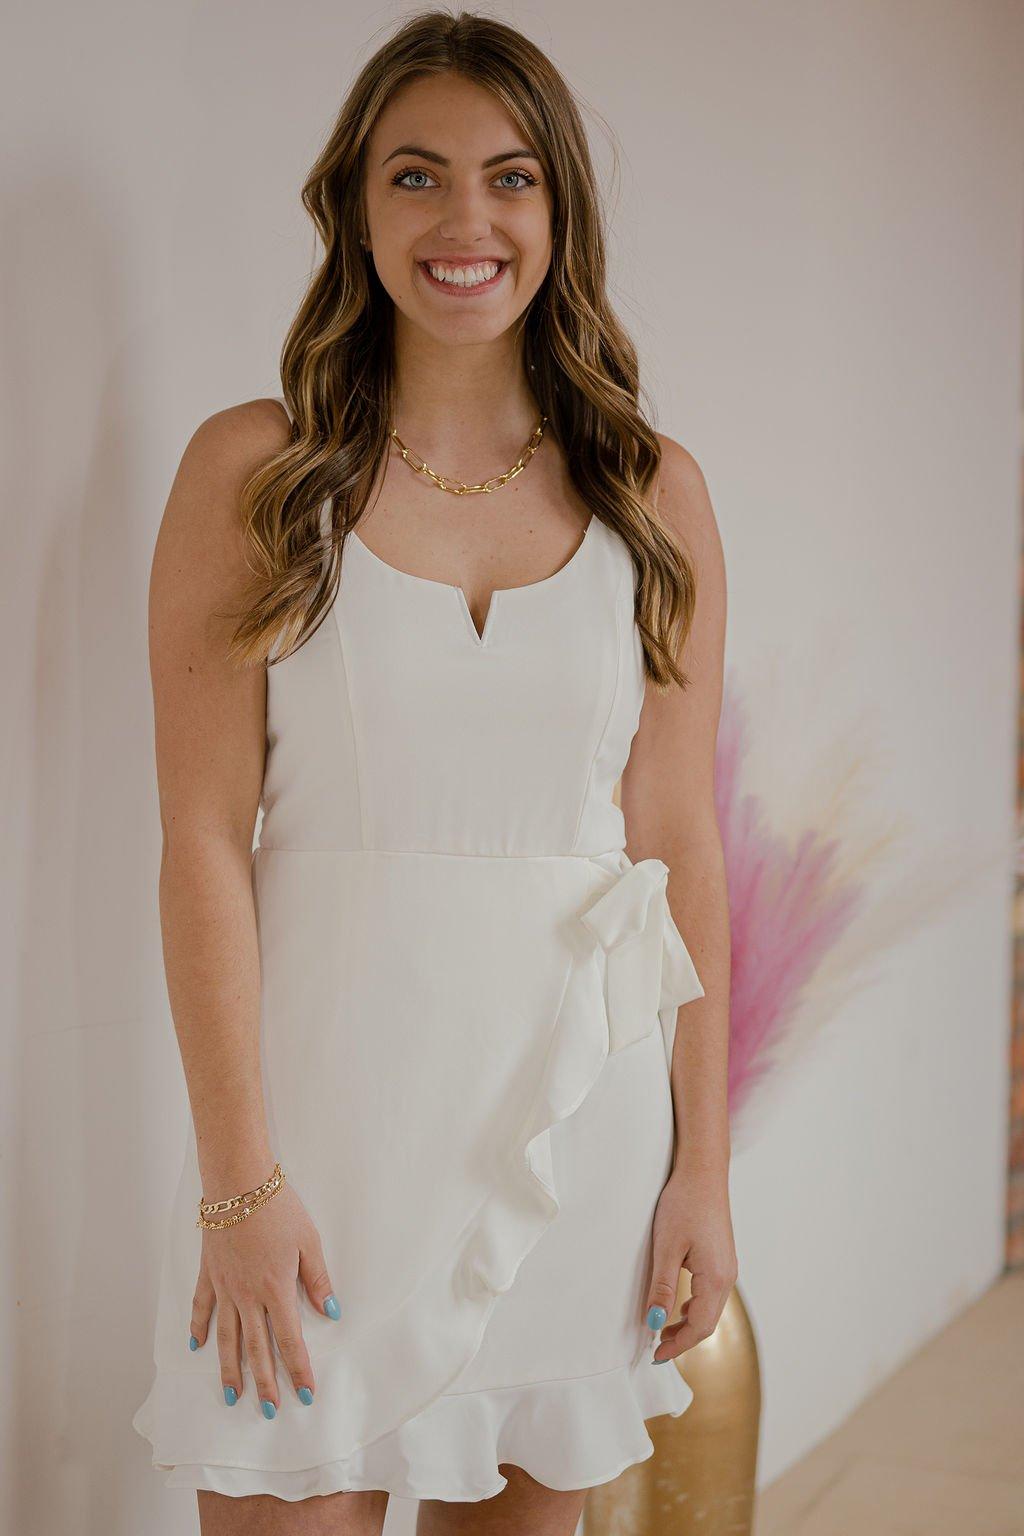 She + Sky Off White Dress